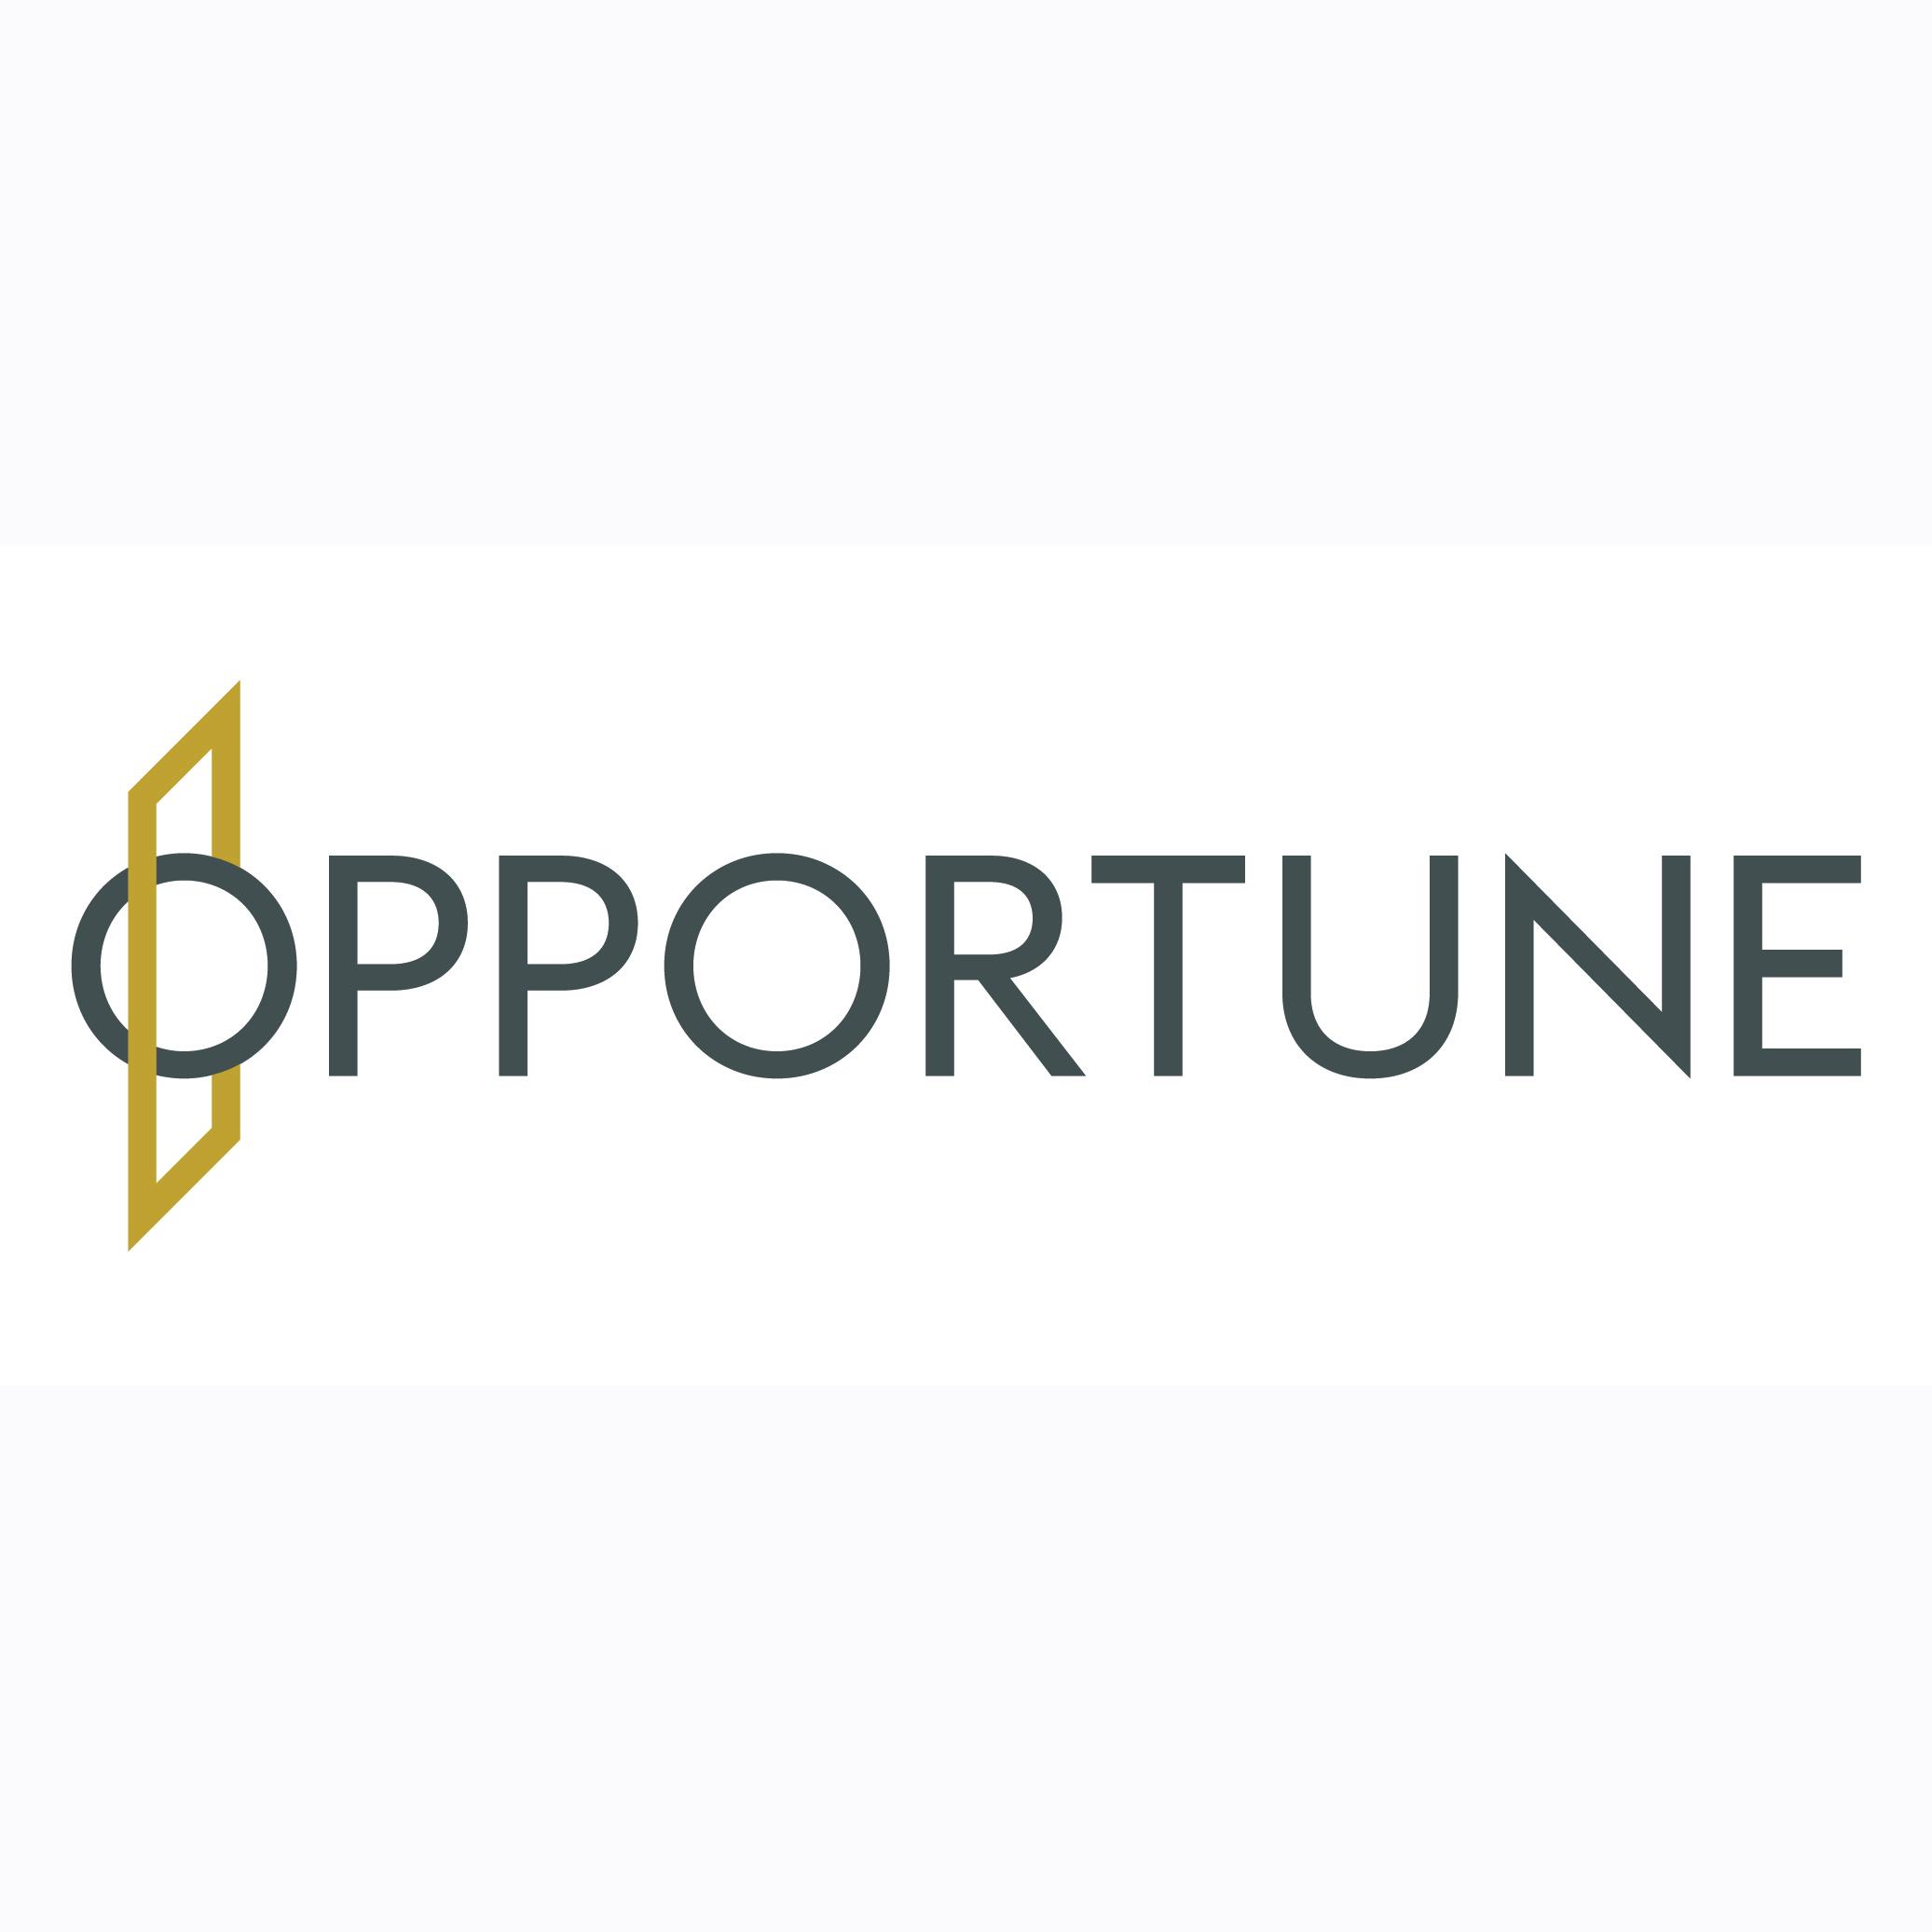 Opportune LLP Brand Awareness Case Study| Pierpont